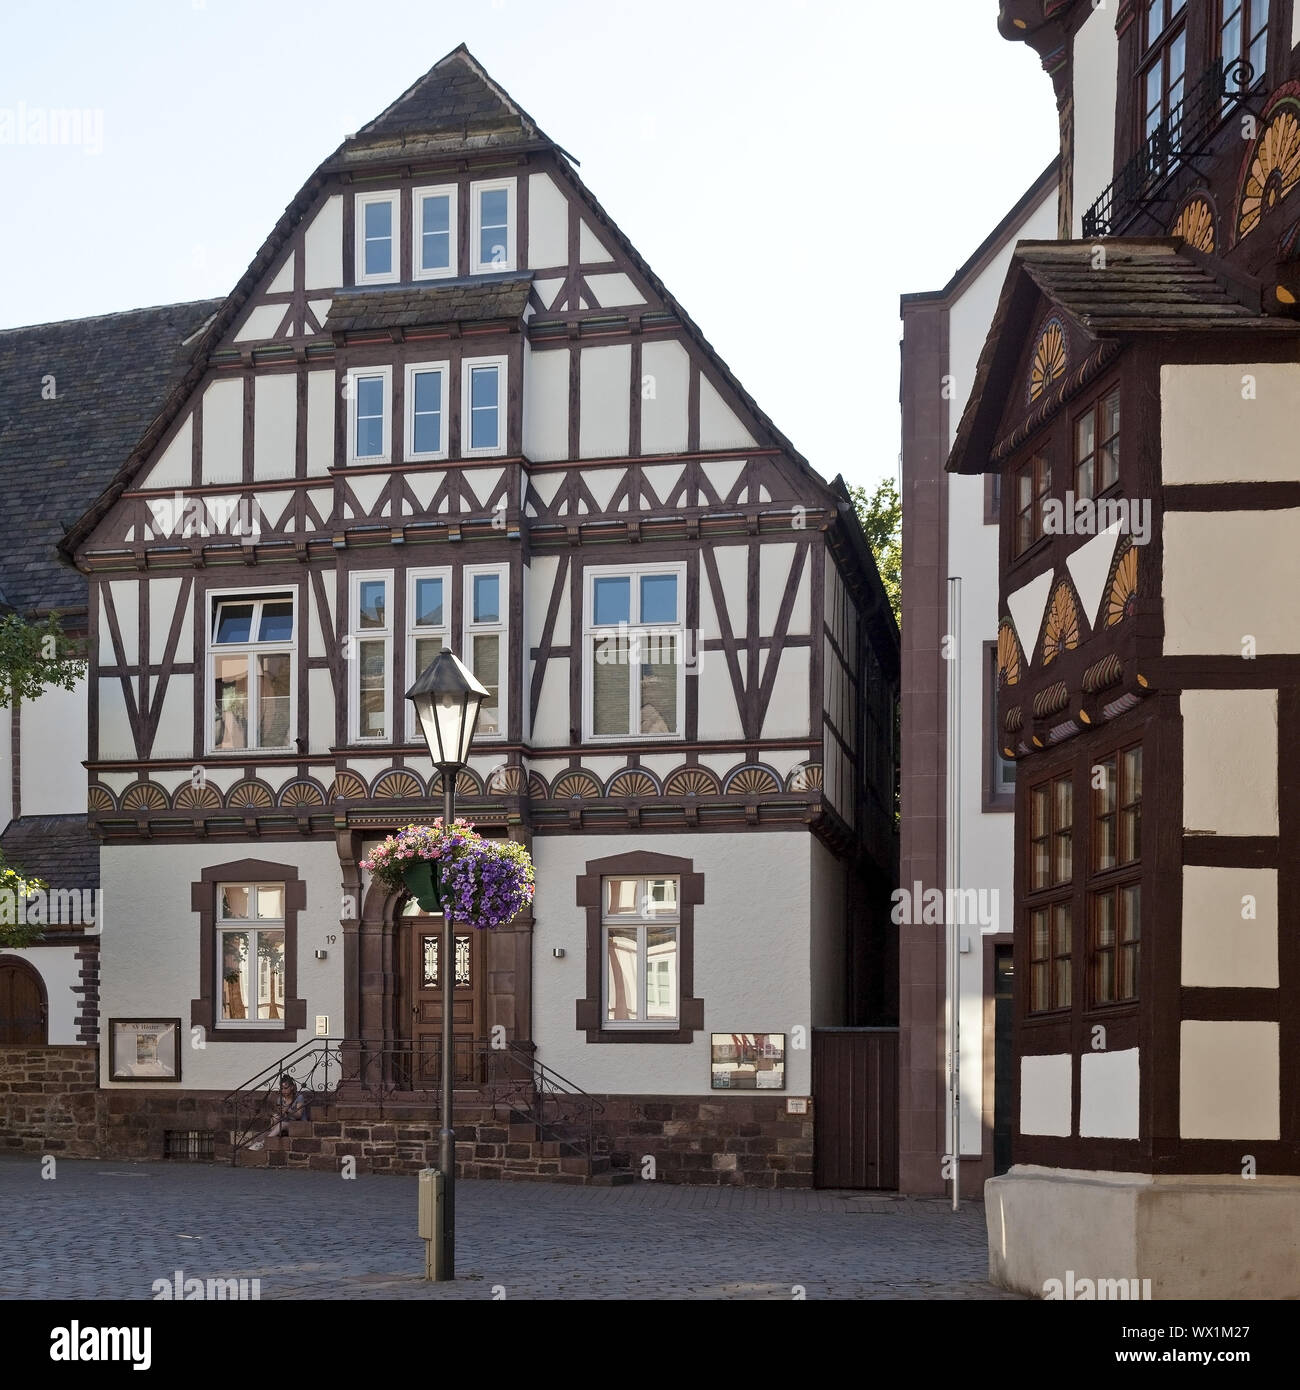 Histórica casa de entramados, Old Town, East, Weserbergland Hoexter, Westfalia, Alemania, Europa Foto de stock